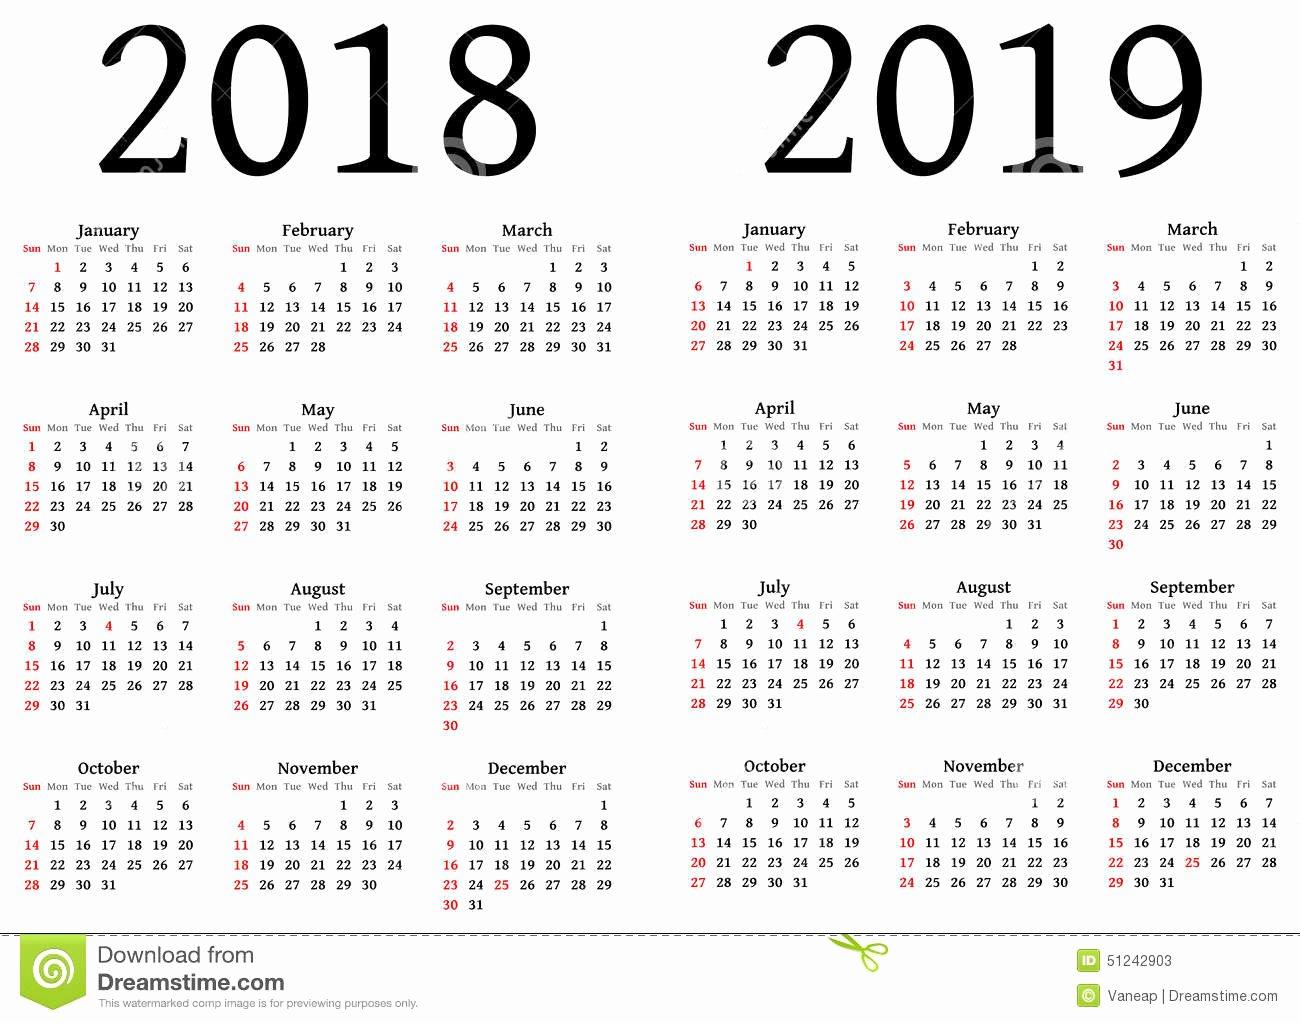 2019 Biweekly Payroll Calendar Template Fresh Adp Payroll Week Calendar 2018